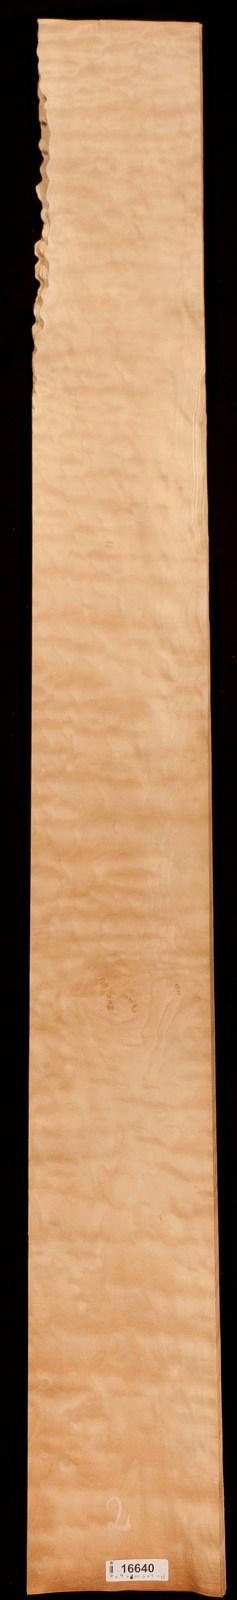 Quilted Maple Veneer Lot